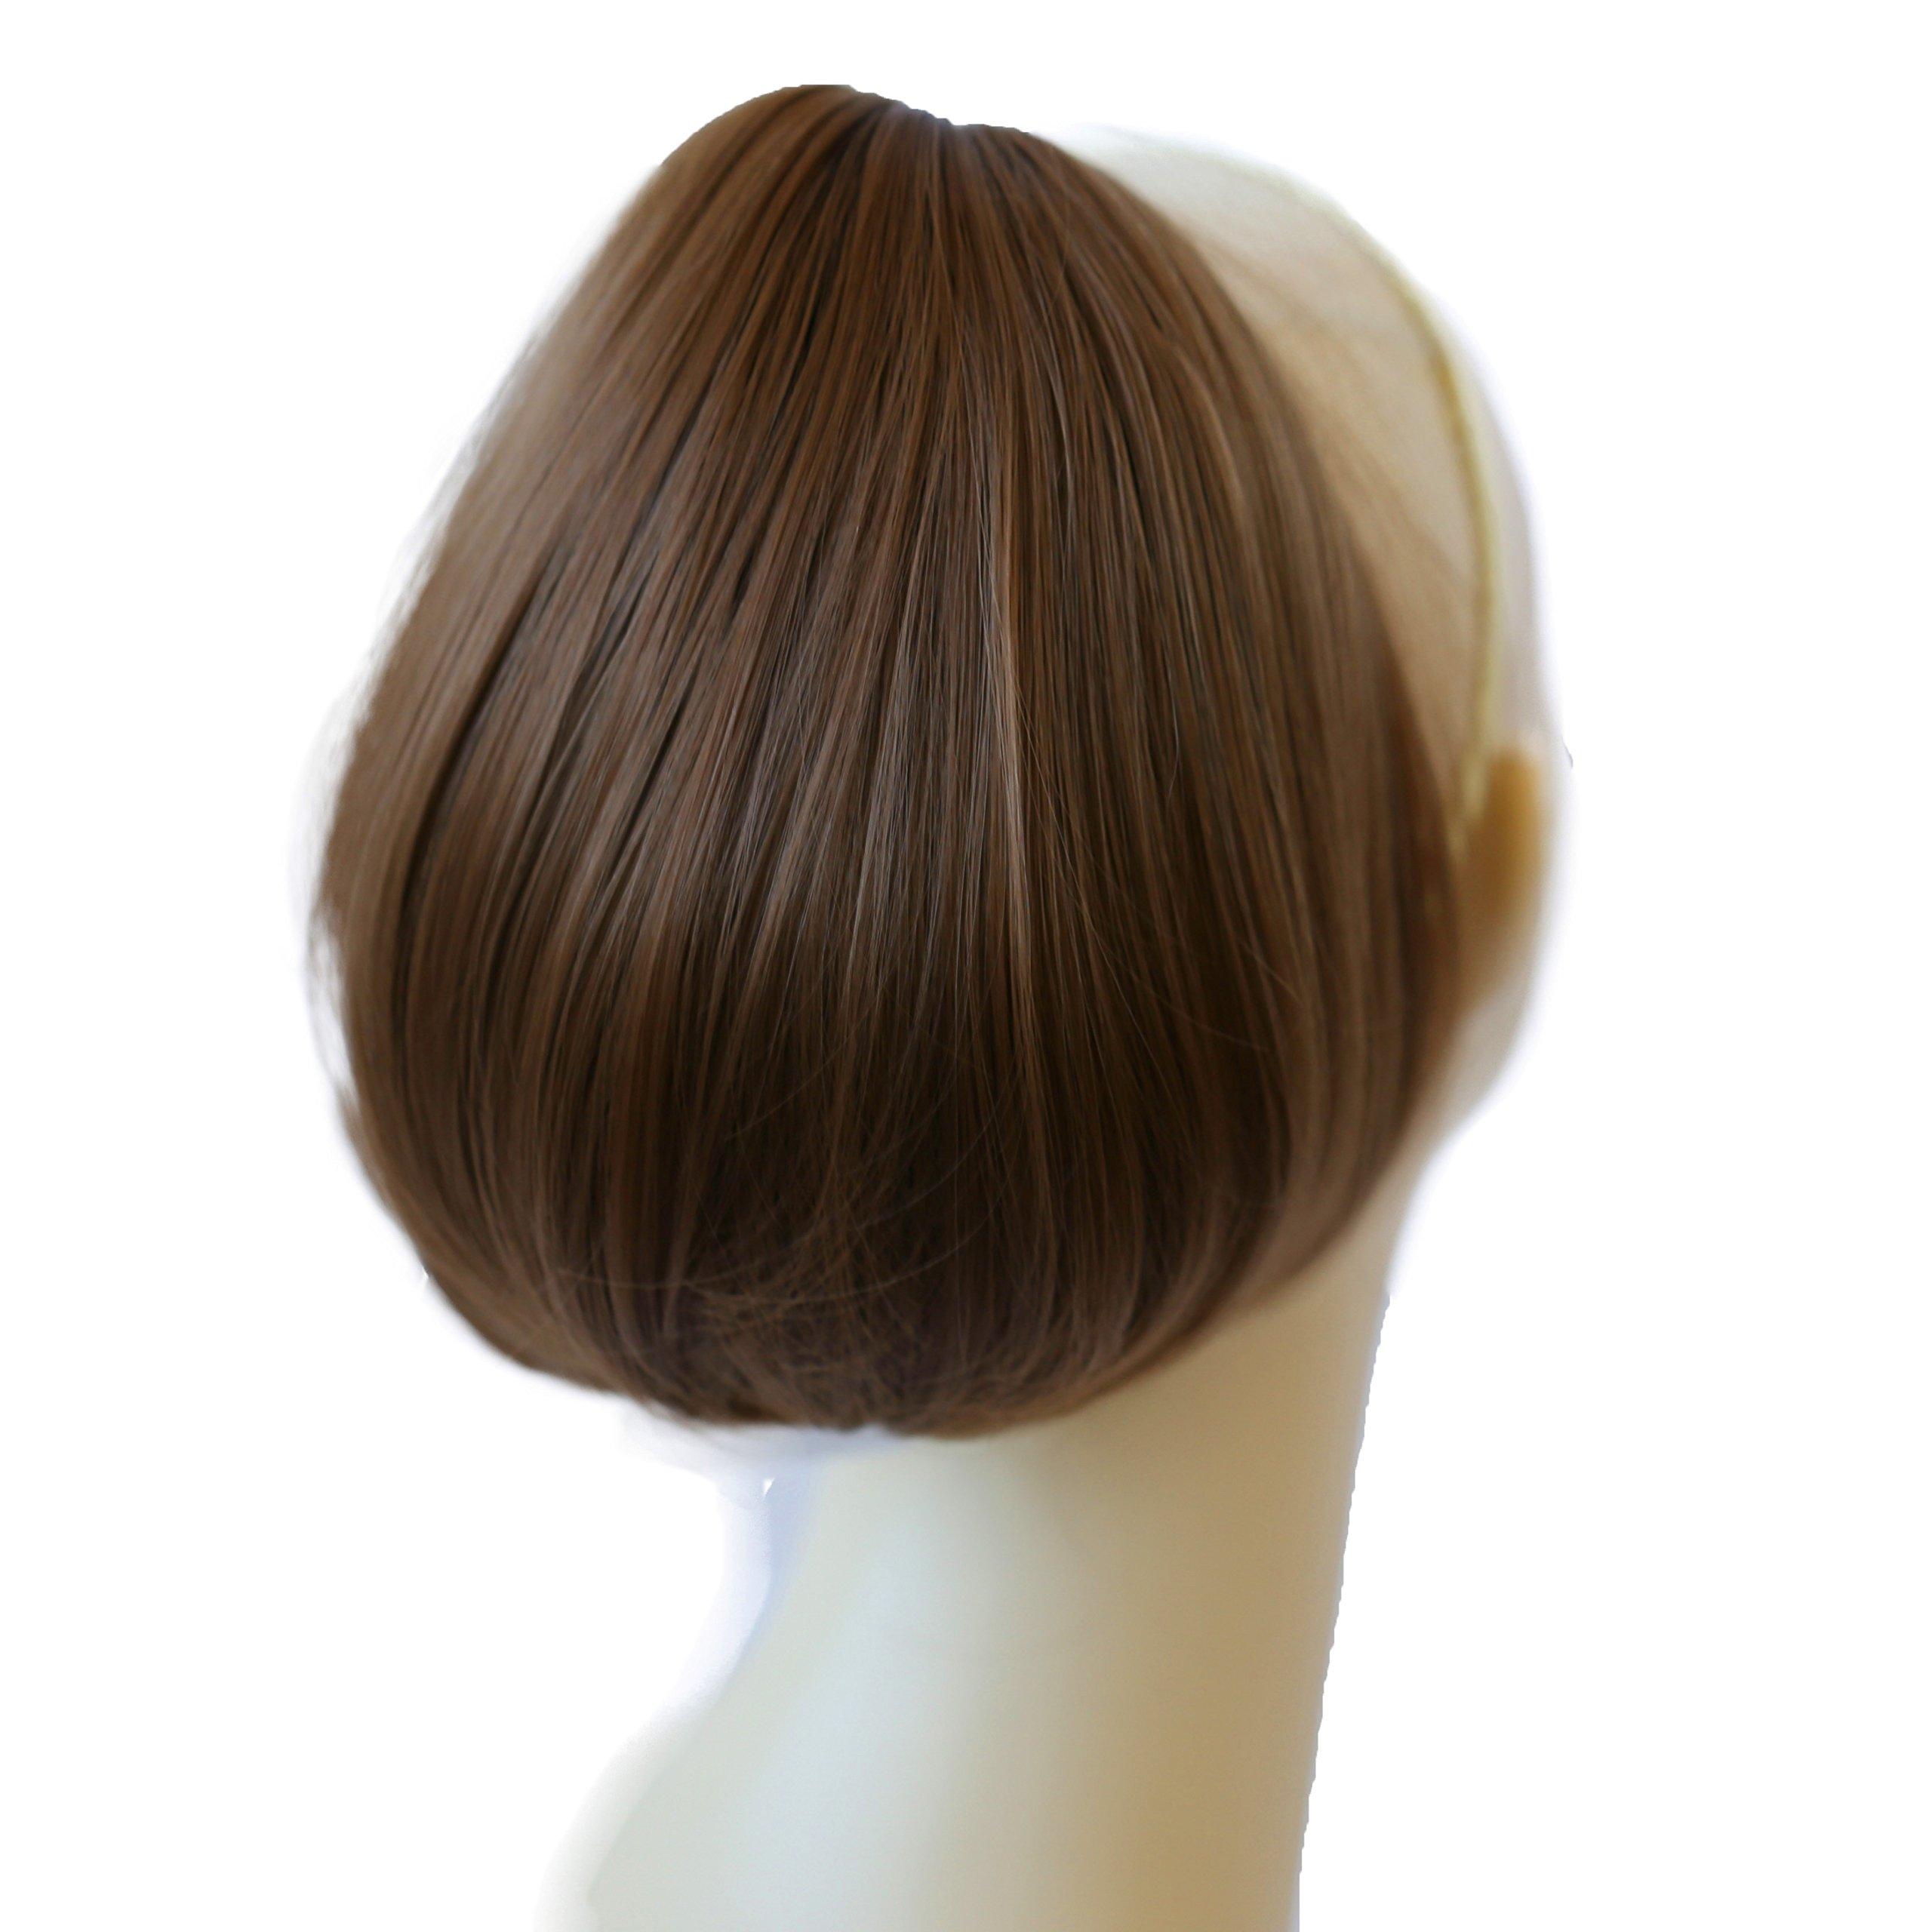 Amazon Prettyshop Bun Up Do Hair Piece Ponytail Extensions